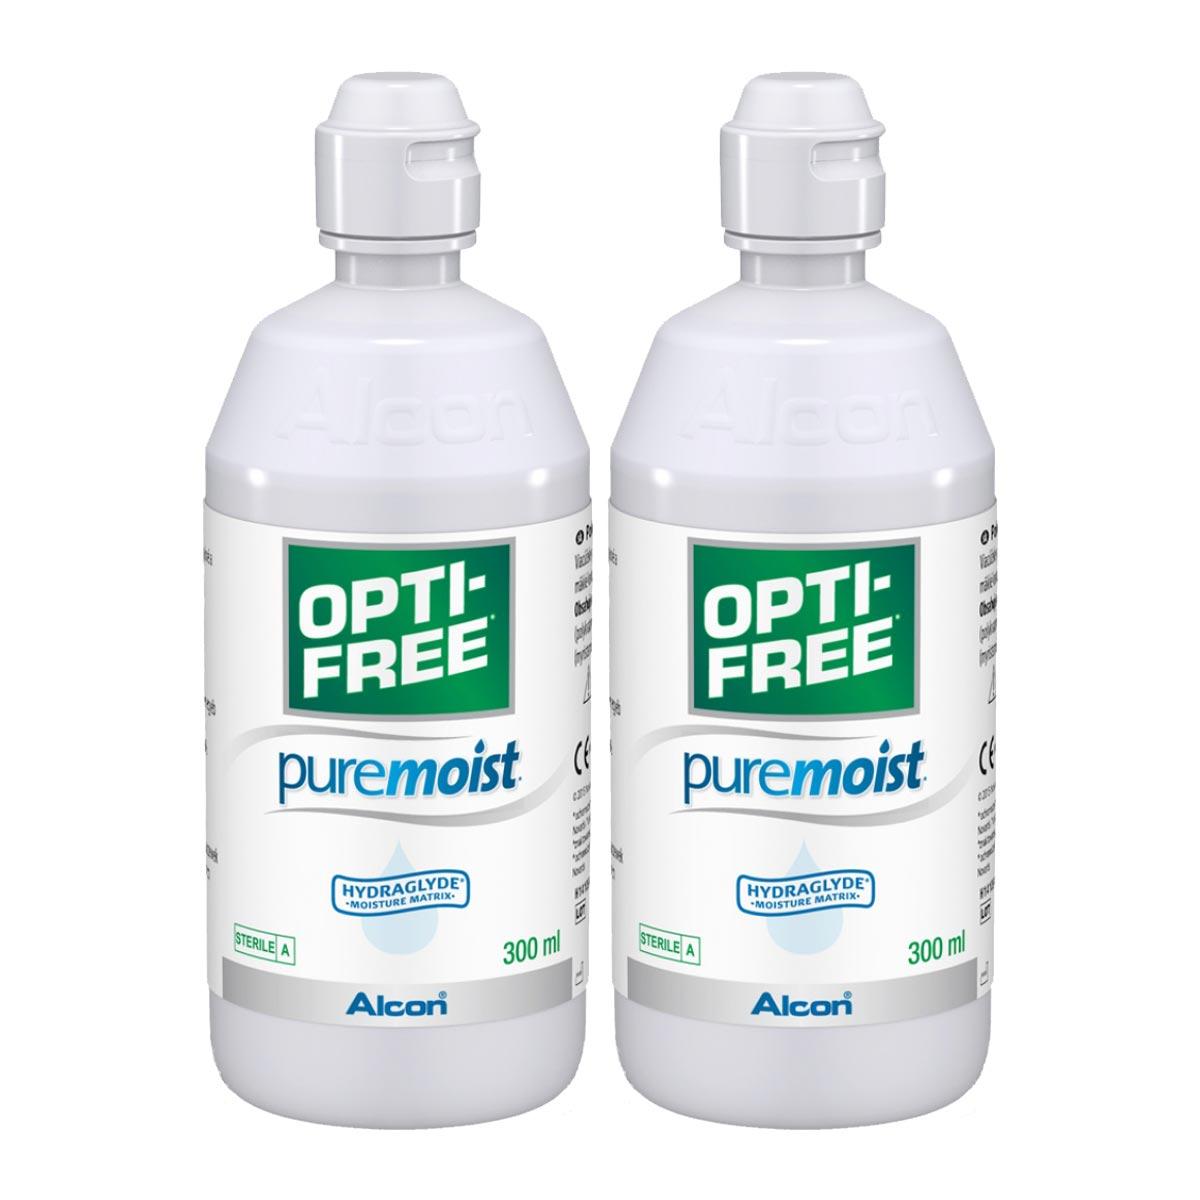 Opti-Free PureMoist Twin Pack (2*300ml)